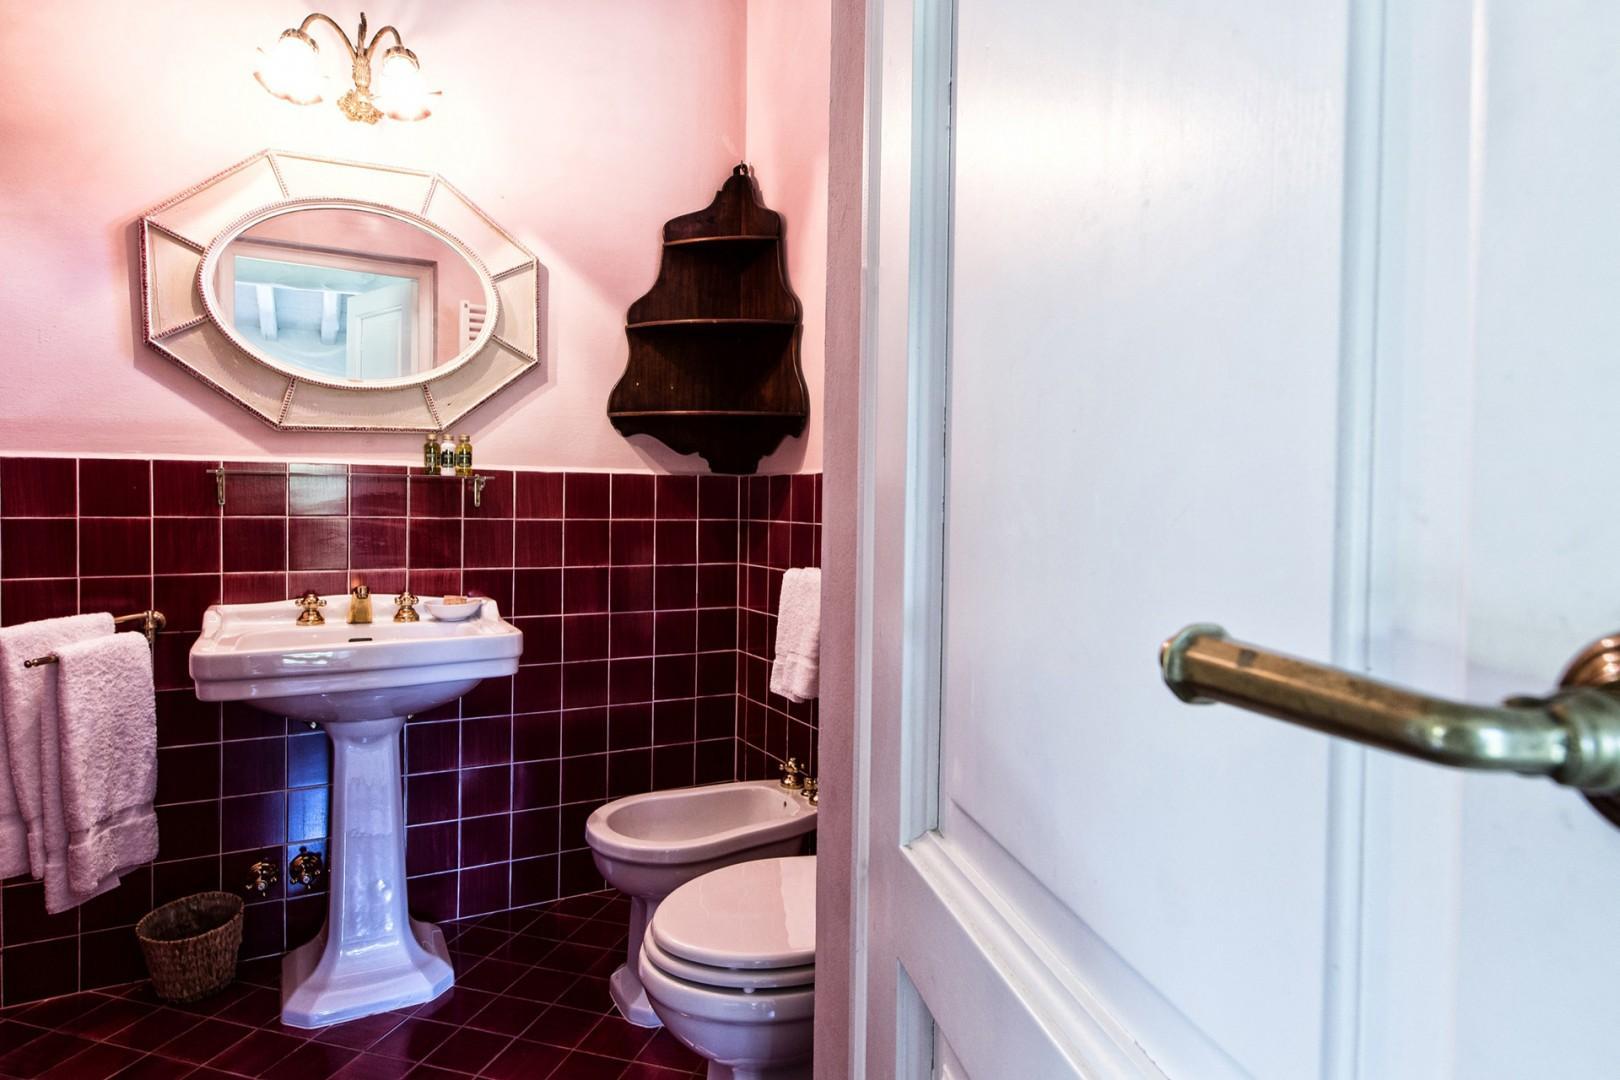 En suite bathroom 2 with shower, sink, toilet, and bidet.